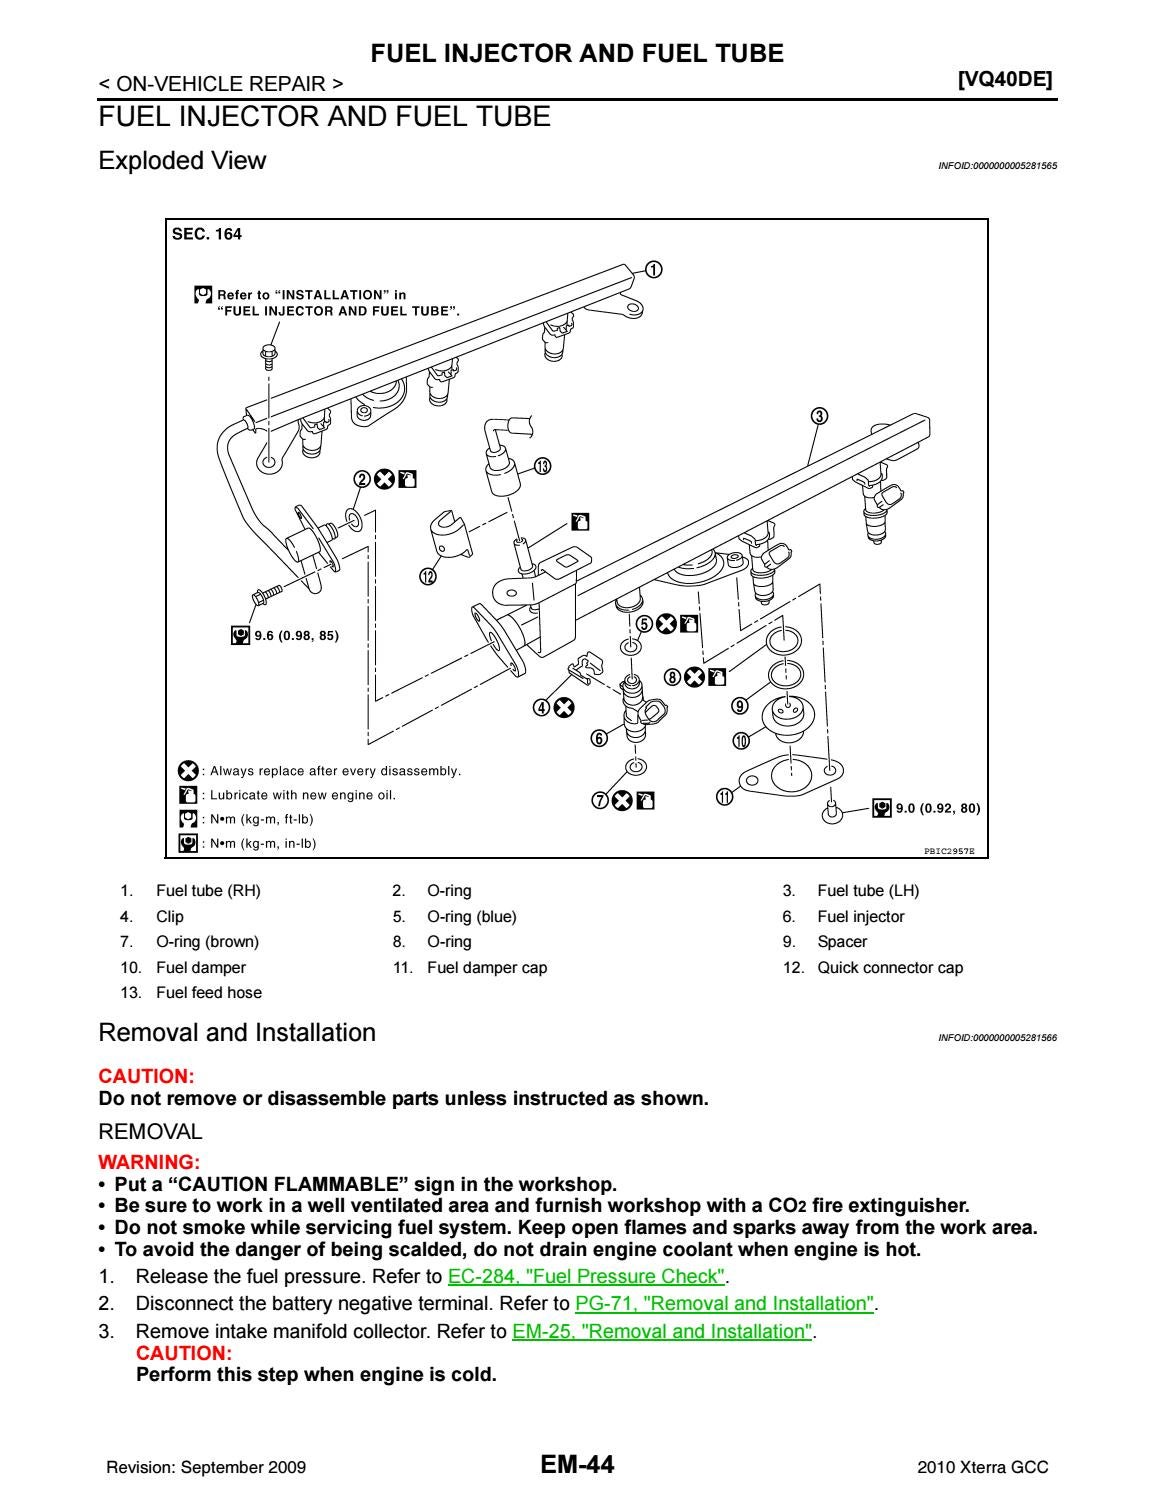 Spacer Fuel Tub Spacers Fuel Pumps & Accessories pubfactor.ma